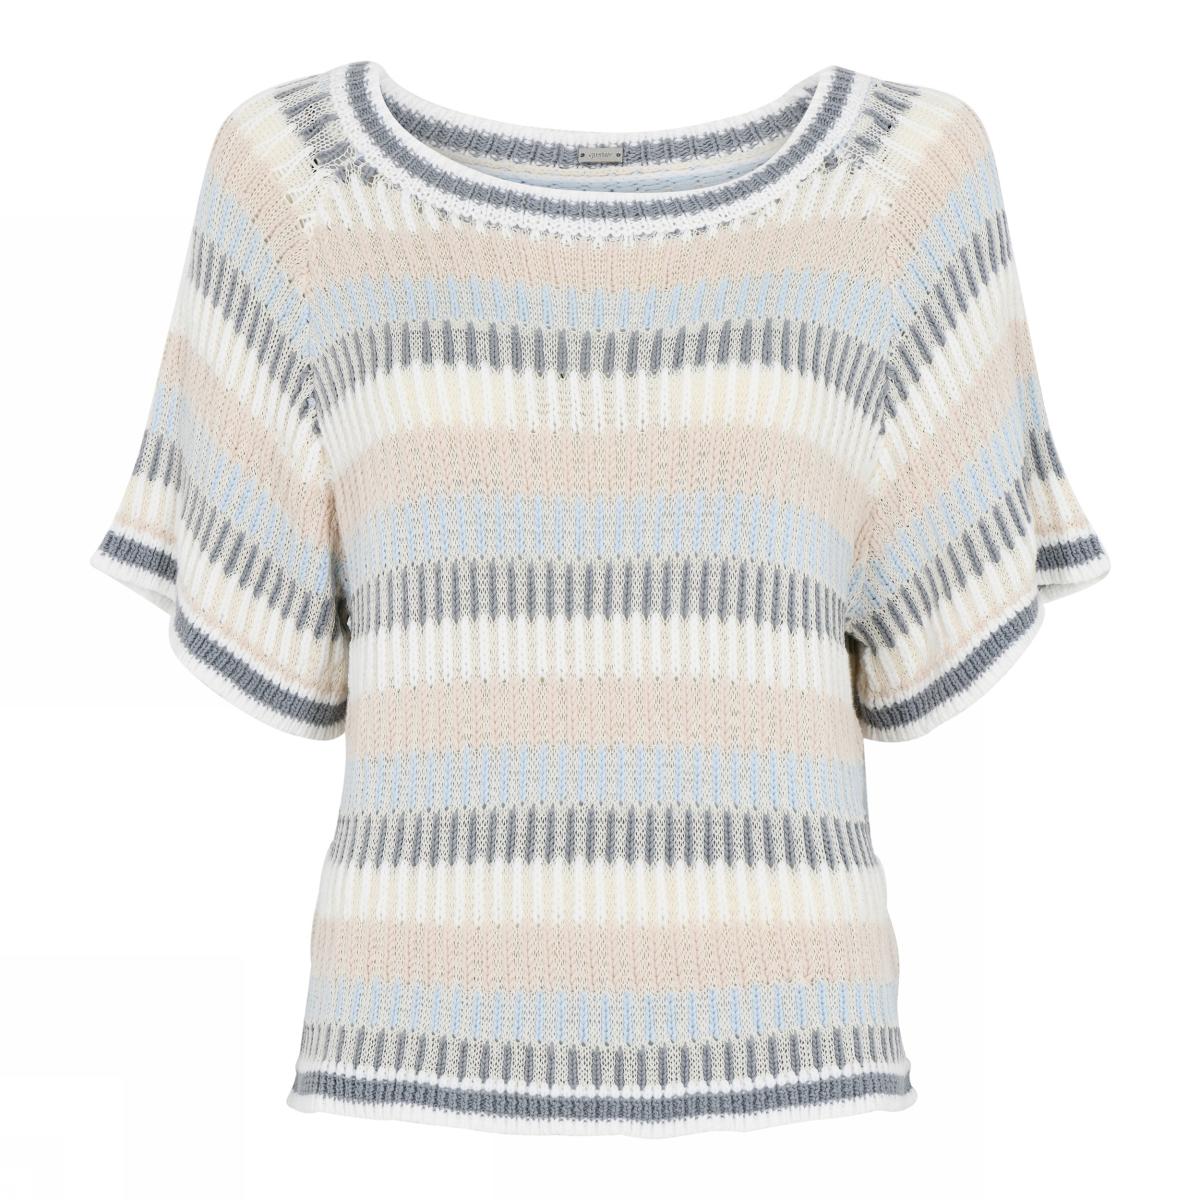 dames trui Gustav Helmi striped knit cape  41405-3698-0-4013